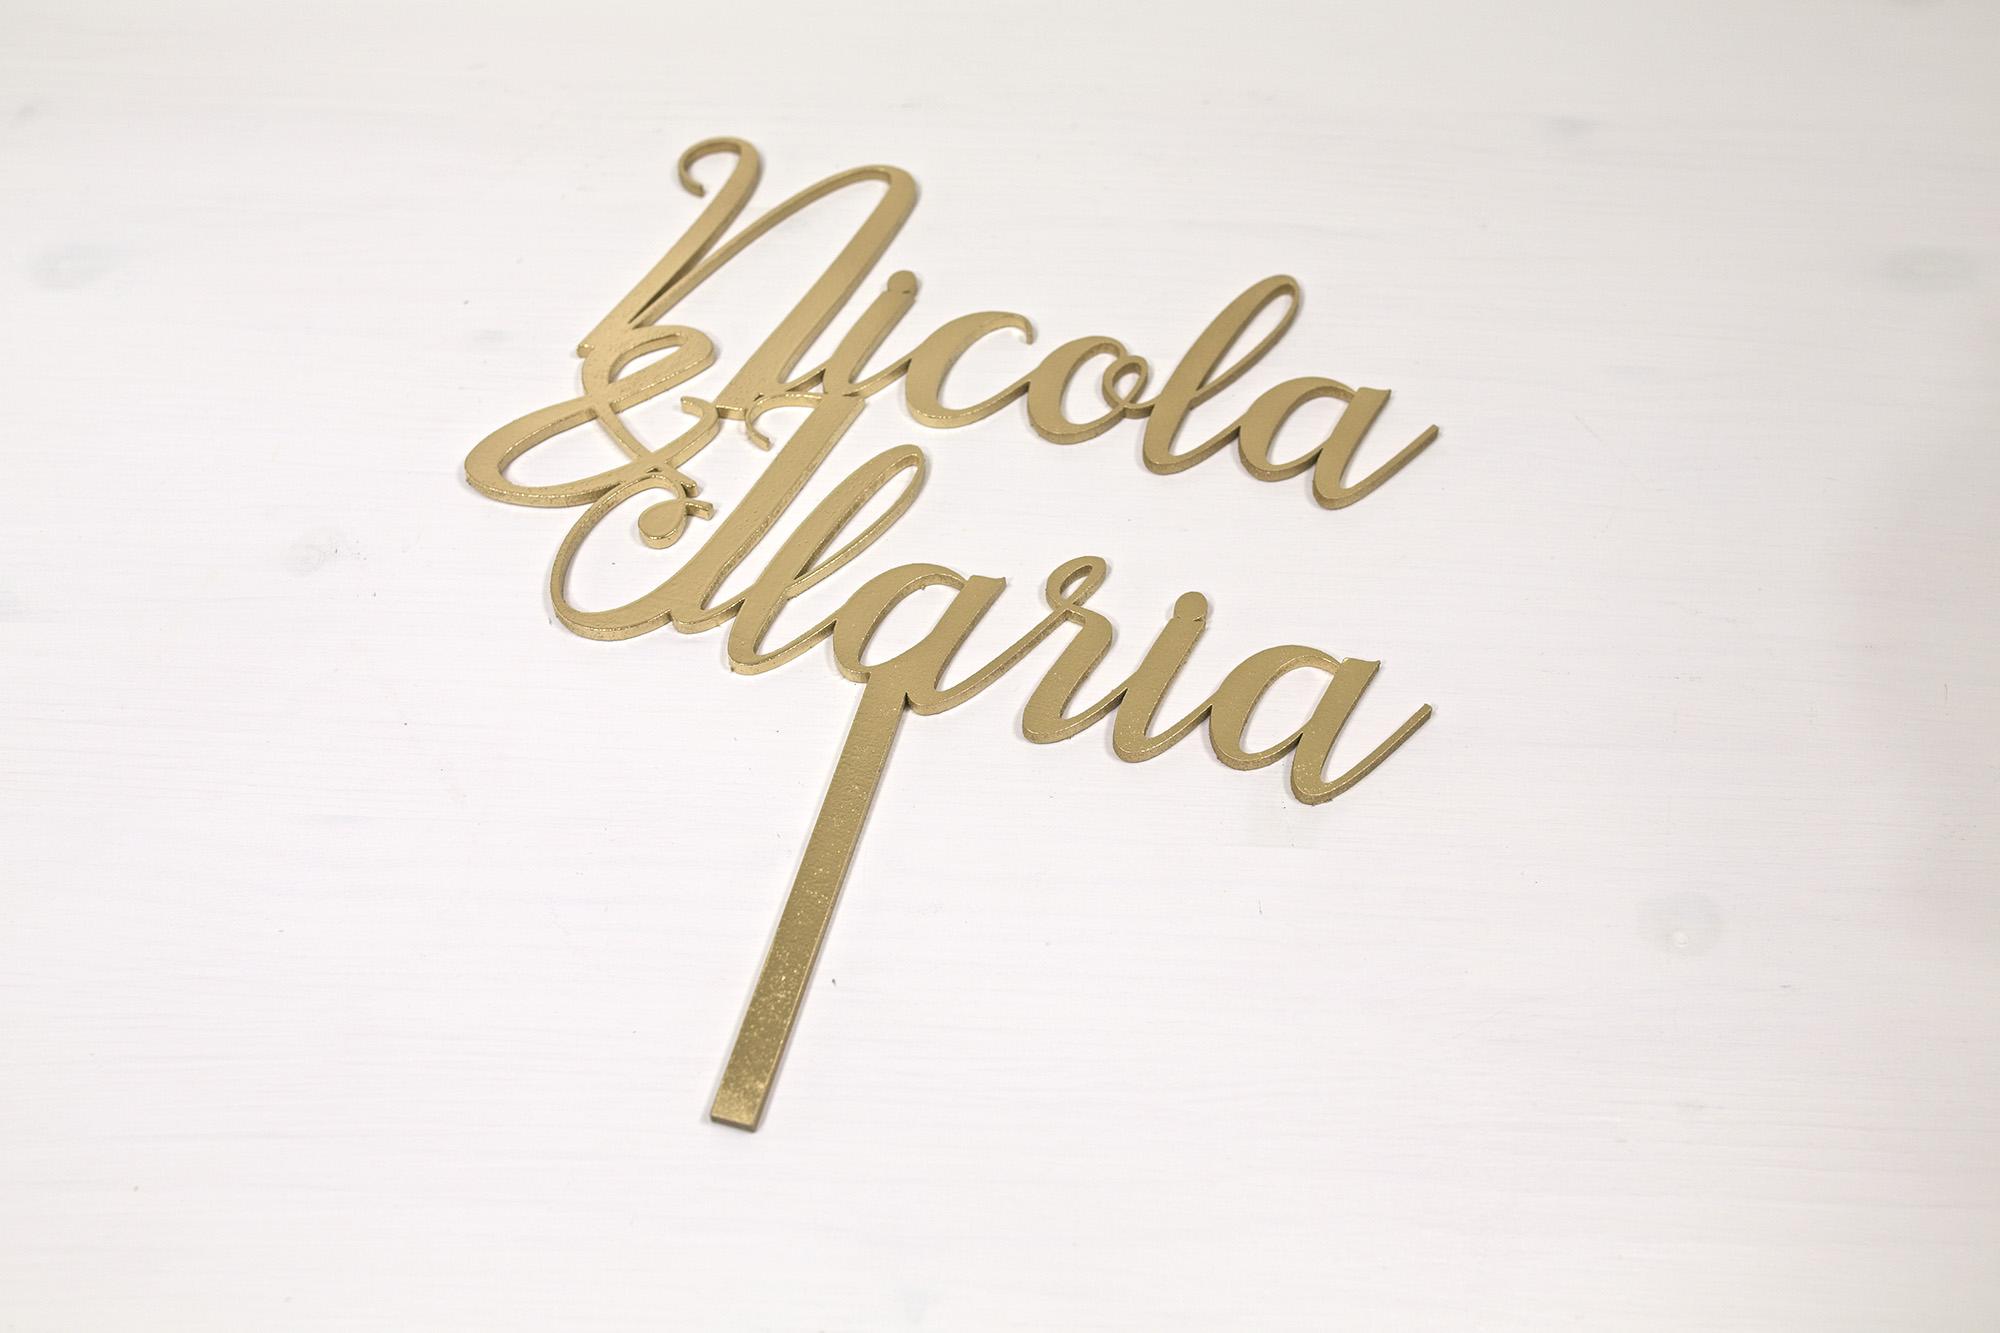 Top Cake Topper - Nicola E Ilaria